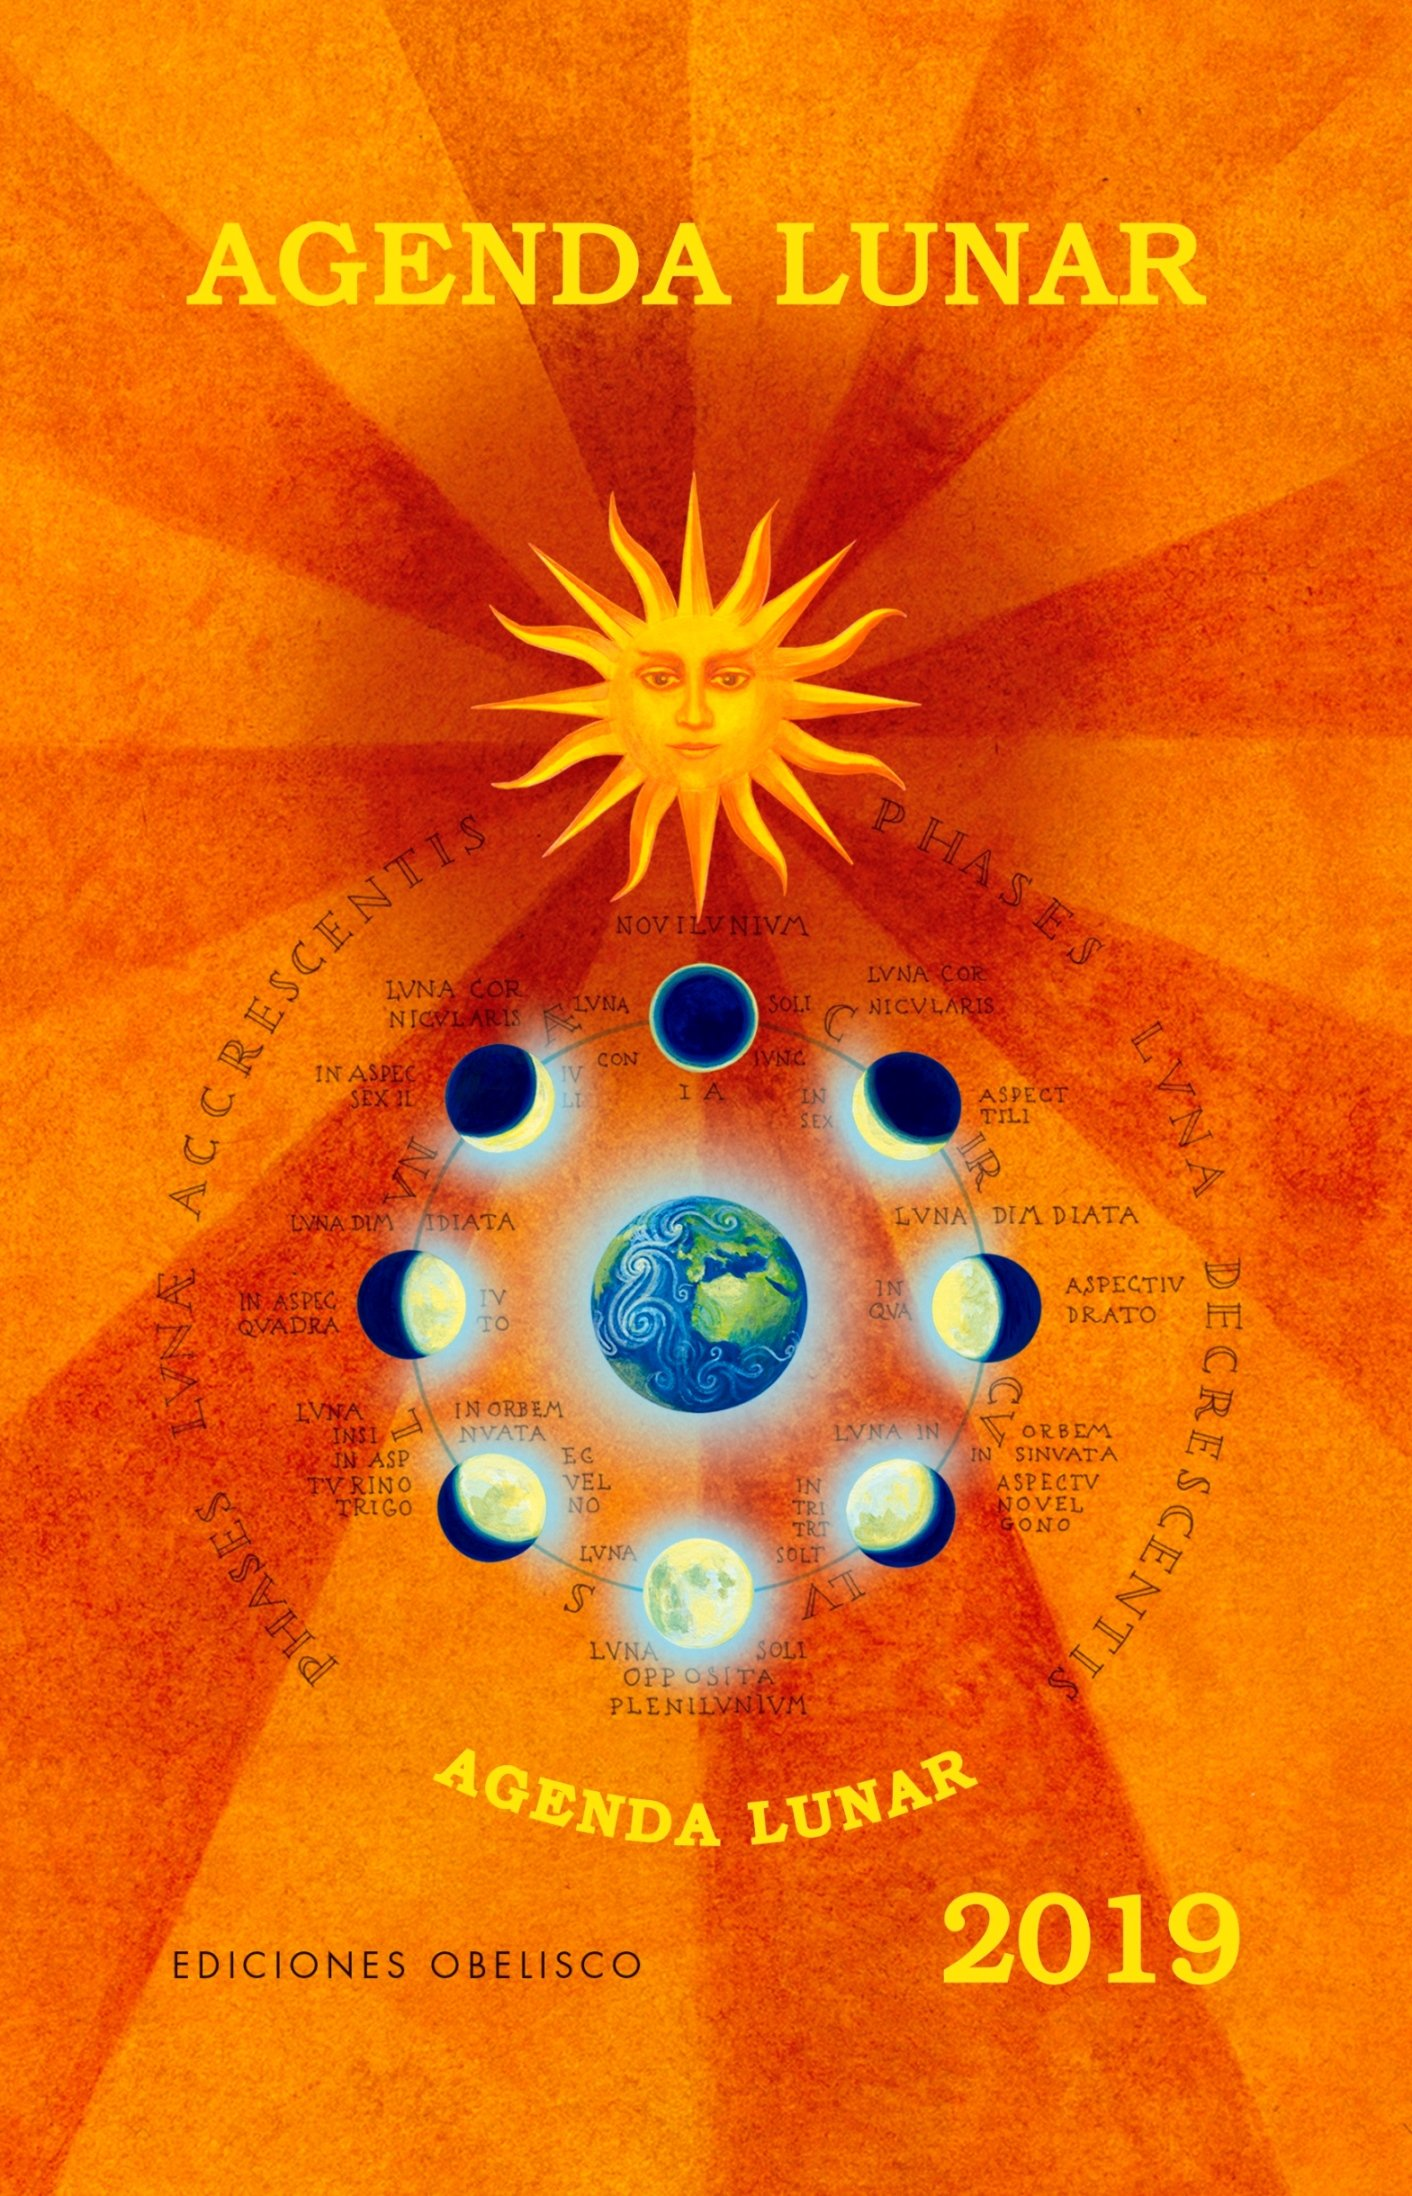 Agenda Lunar 2019 (AGENDAS) Tapa blanda – Agenda, 3 sep 2018 Holdnaptar EDICIONES OBELISCO S.L. 8491113622 BODY